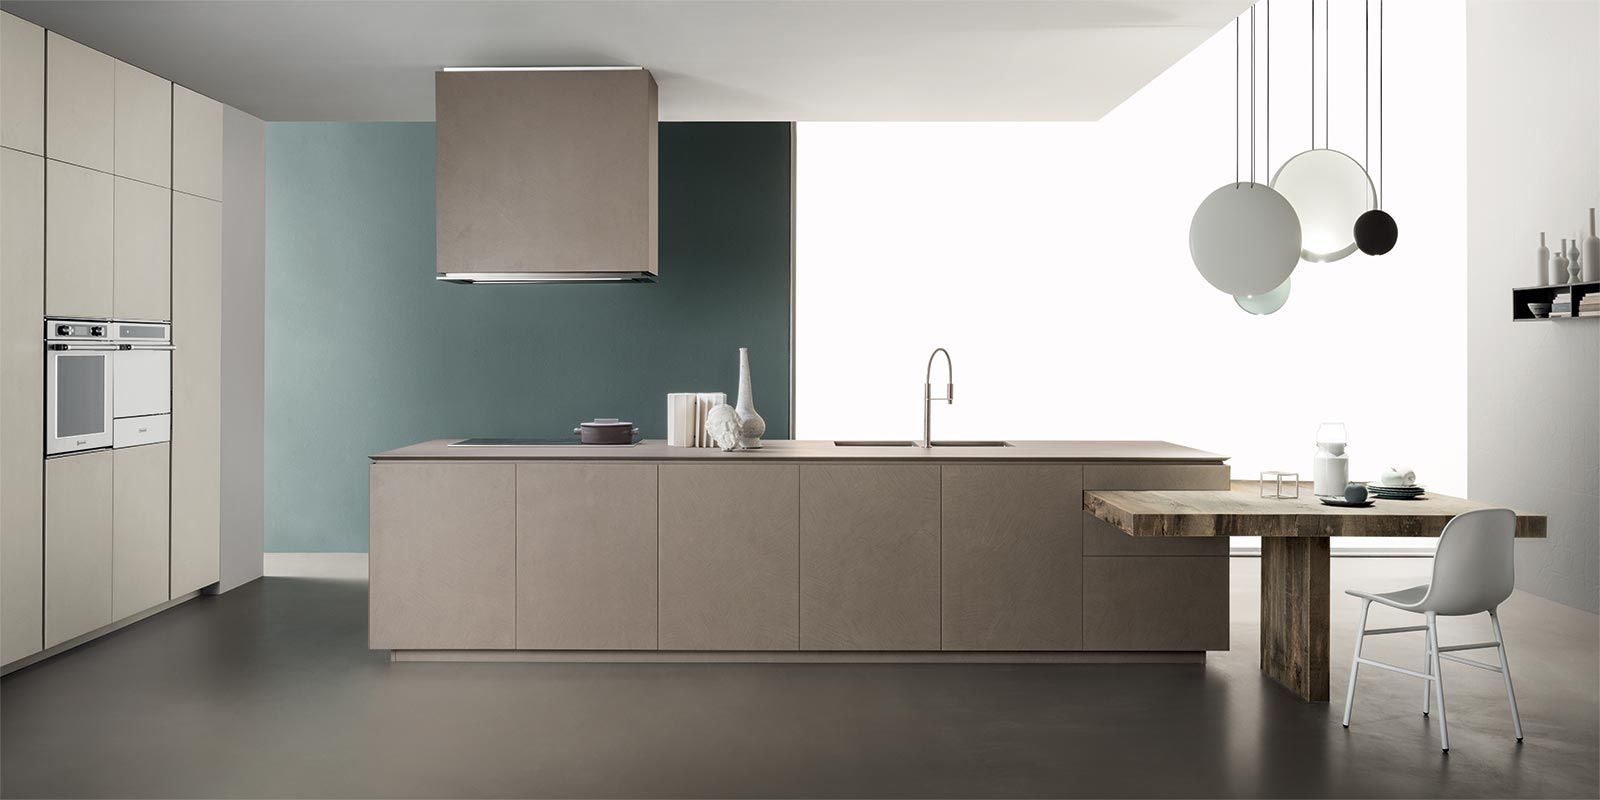 Cucina Obliqua Ernestomeda  Ernestomeda  Pinterest  Best Best Italian Design Kitchen Inspiration Design